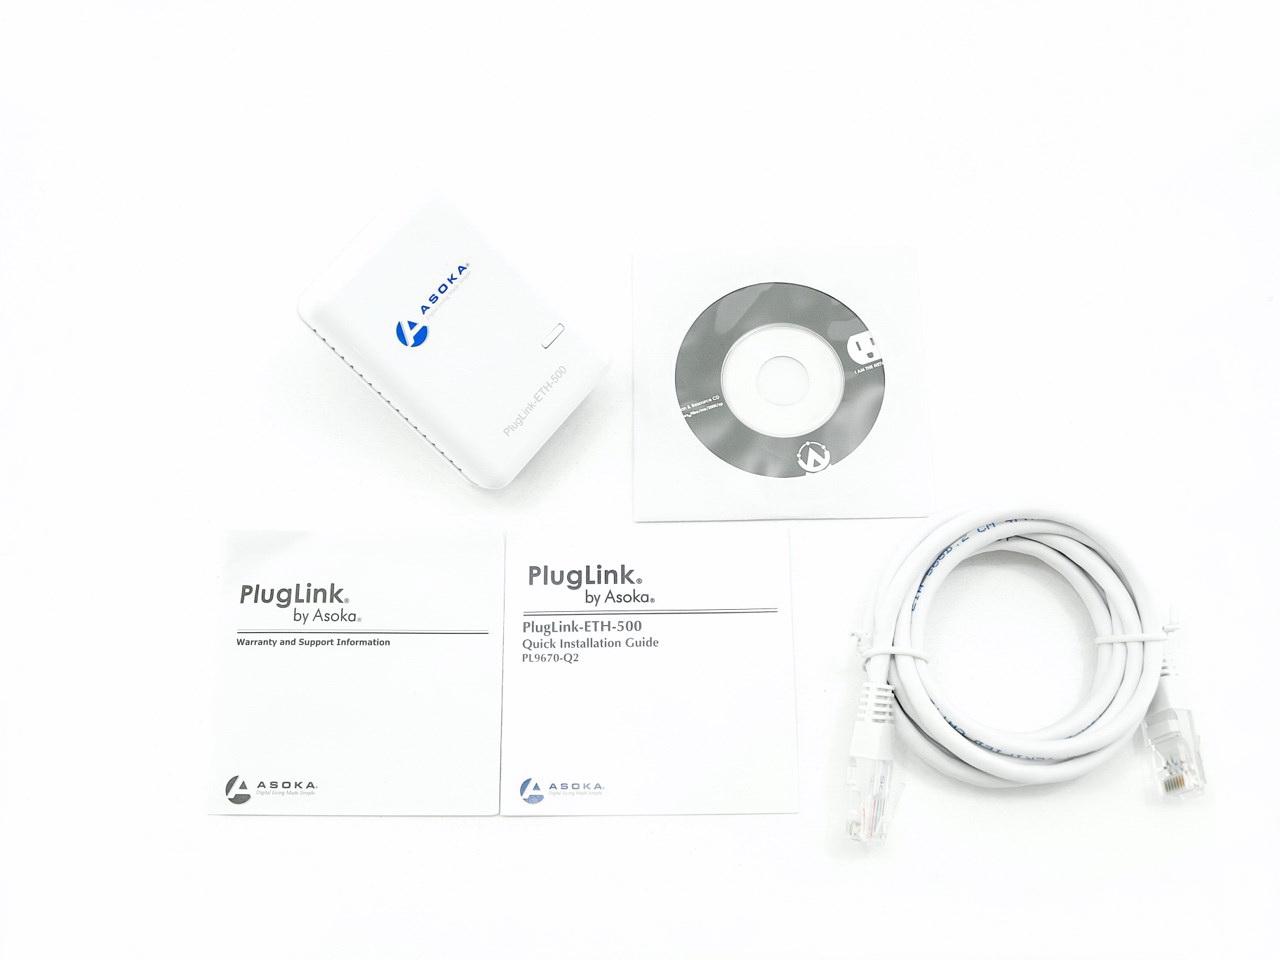 plug power q2 2000 civic si fuse box diagram asoka pluglink pl9760 500mbps dual ethernet powerline